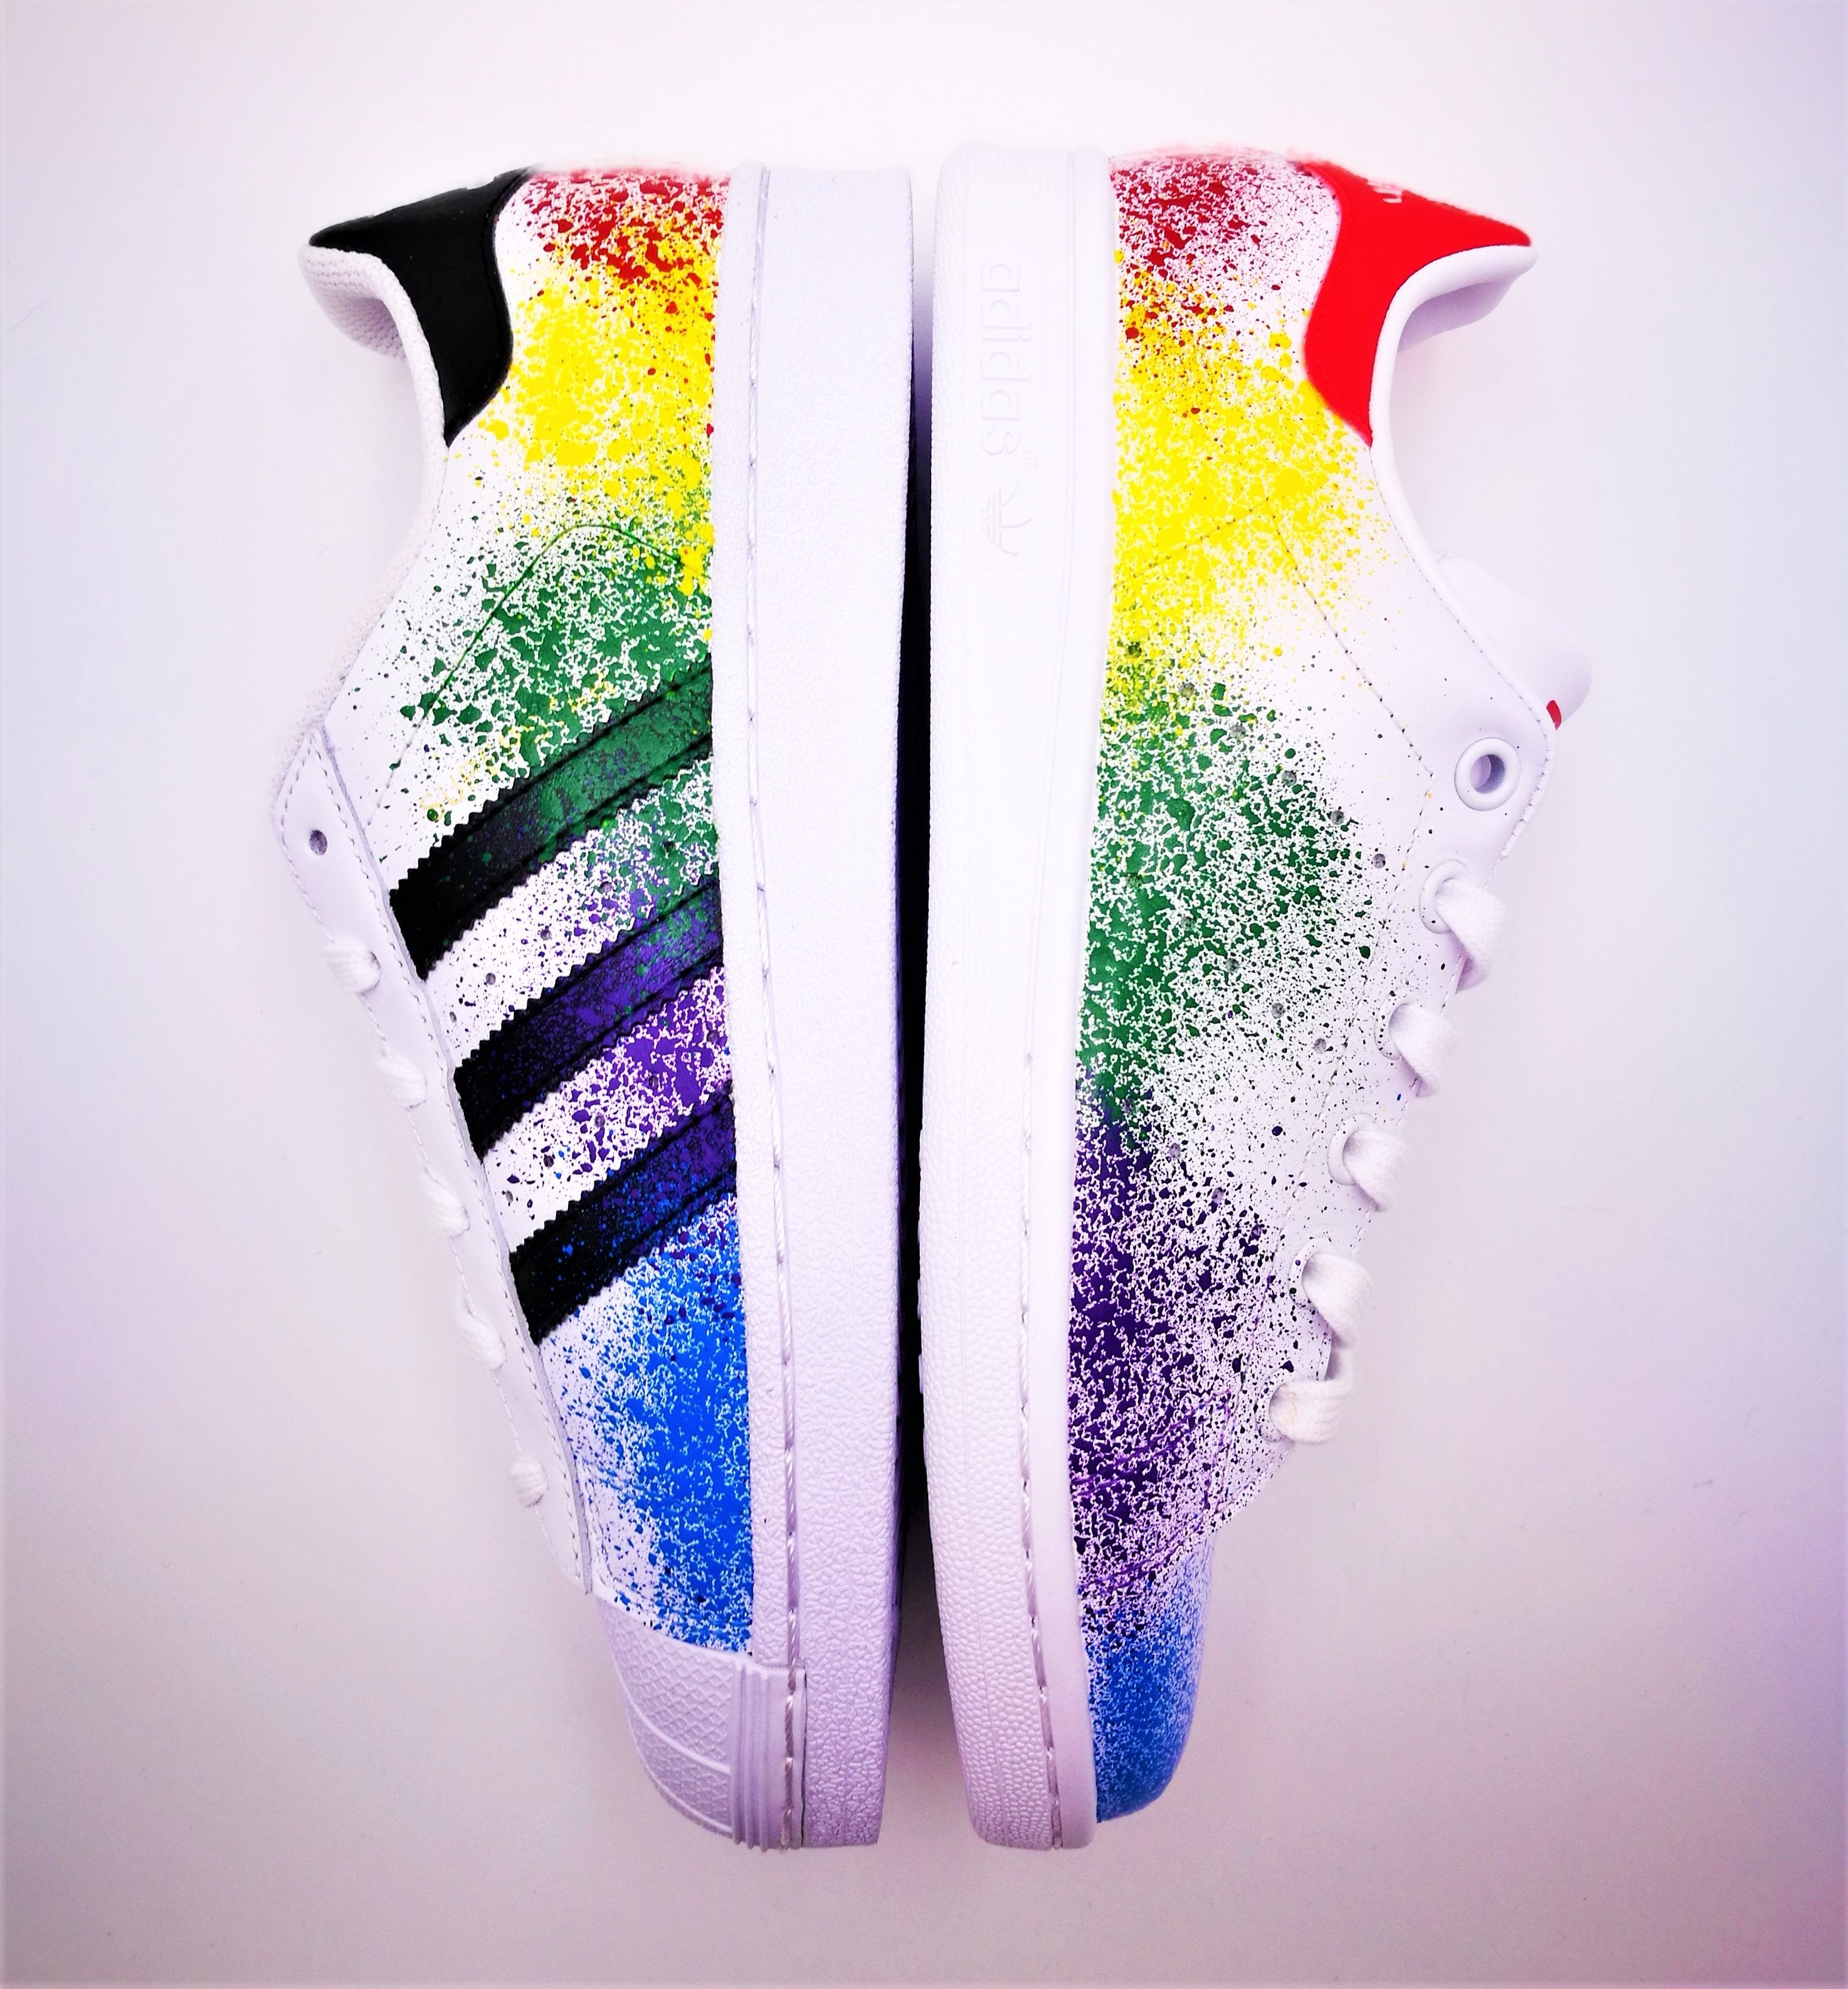 Adidas Color Splash Superstar - Double